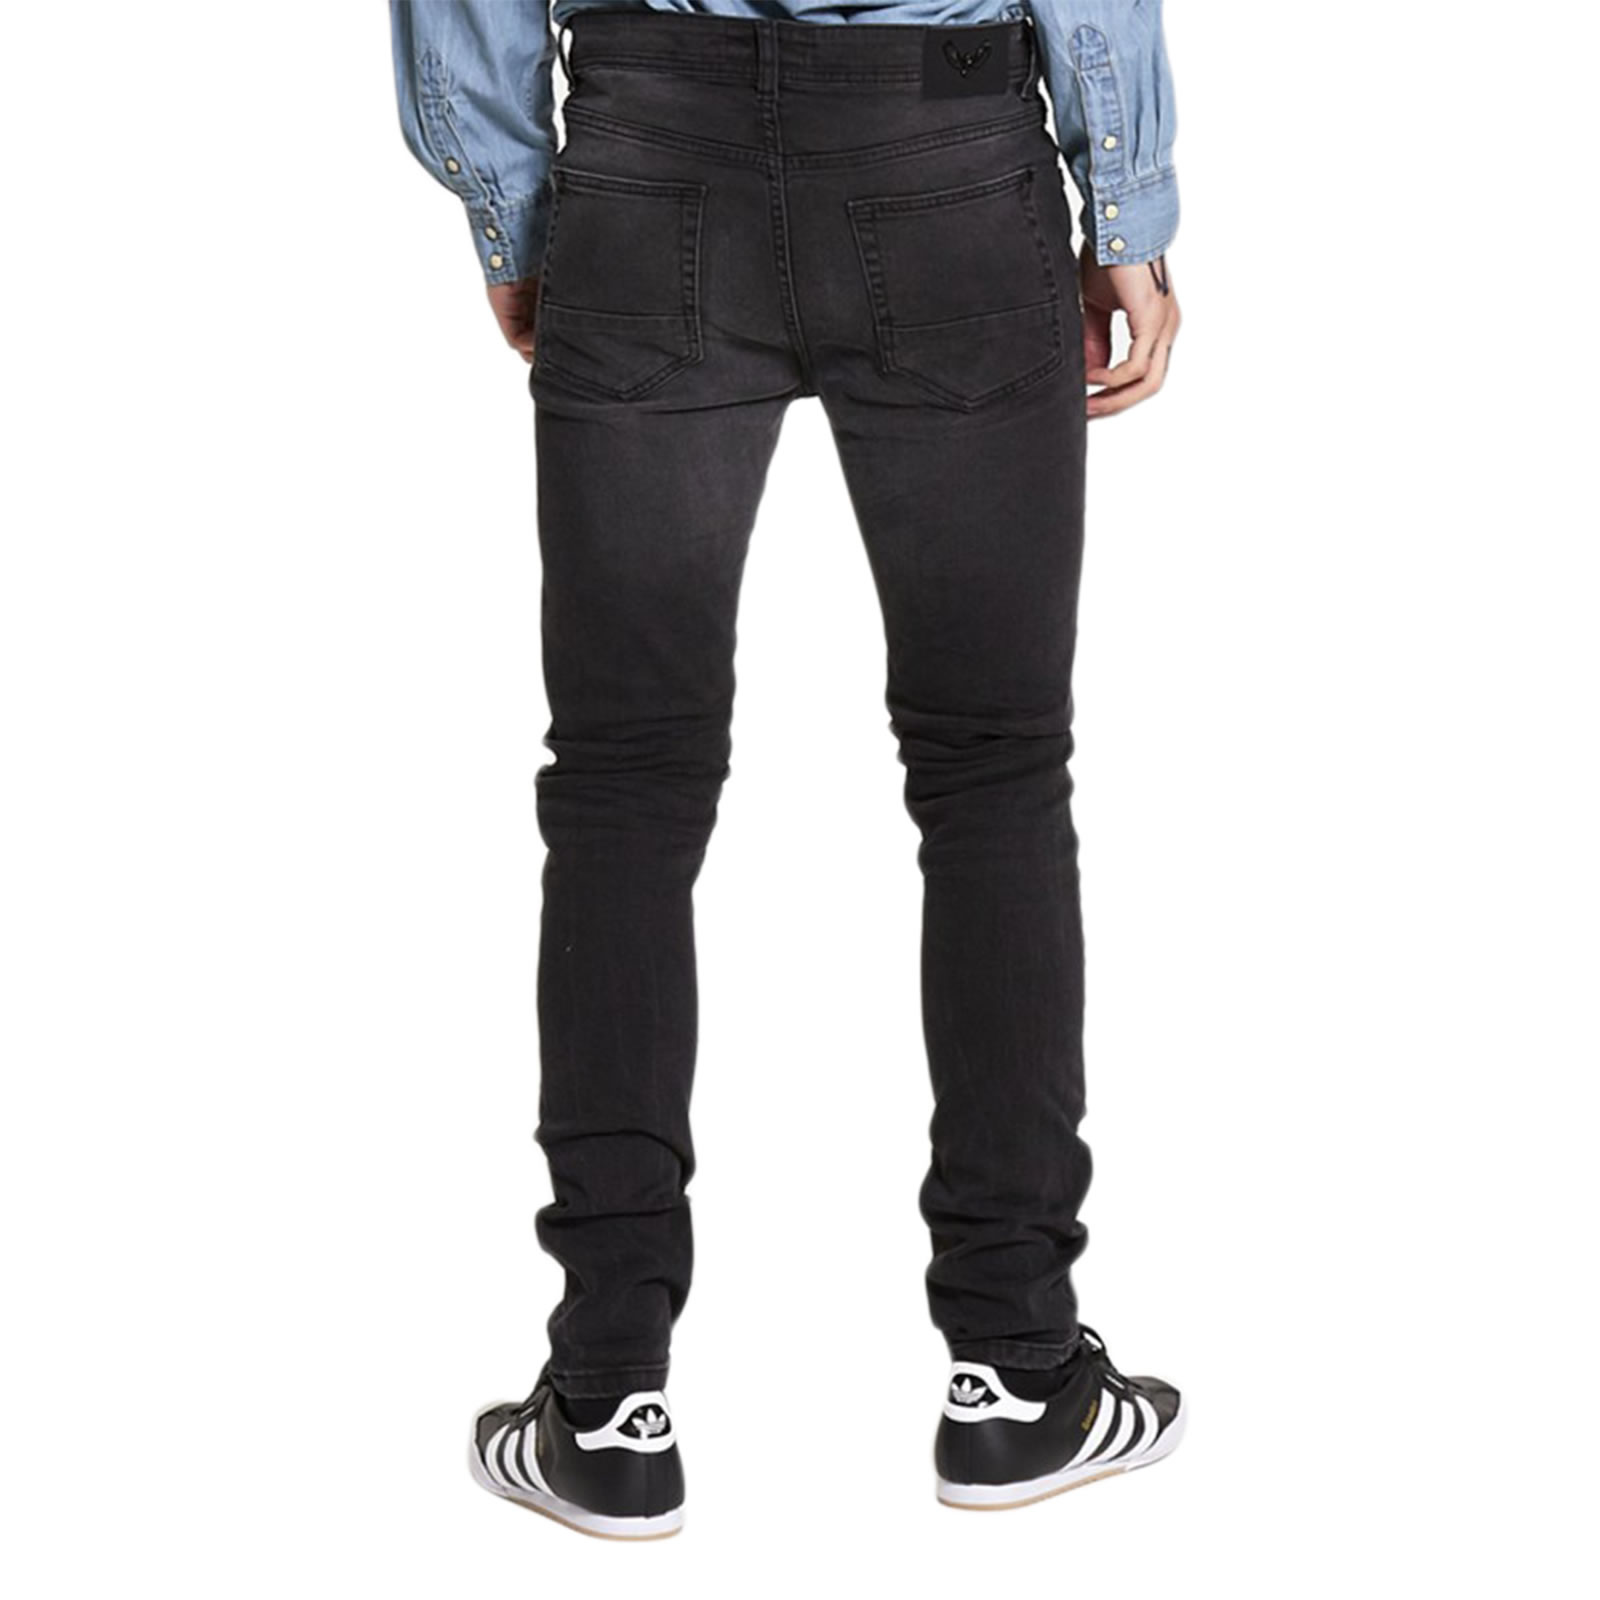 34x28 Mens Jeans